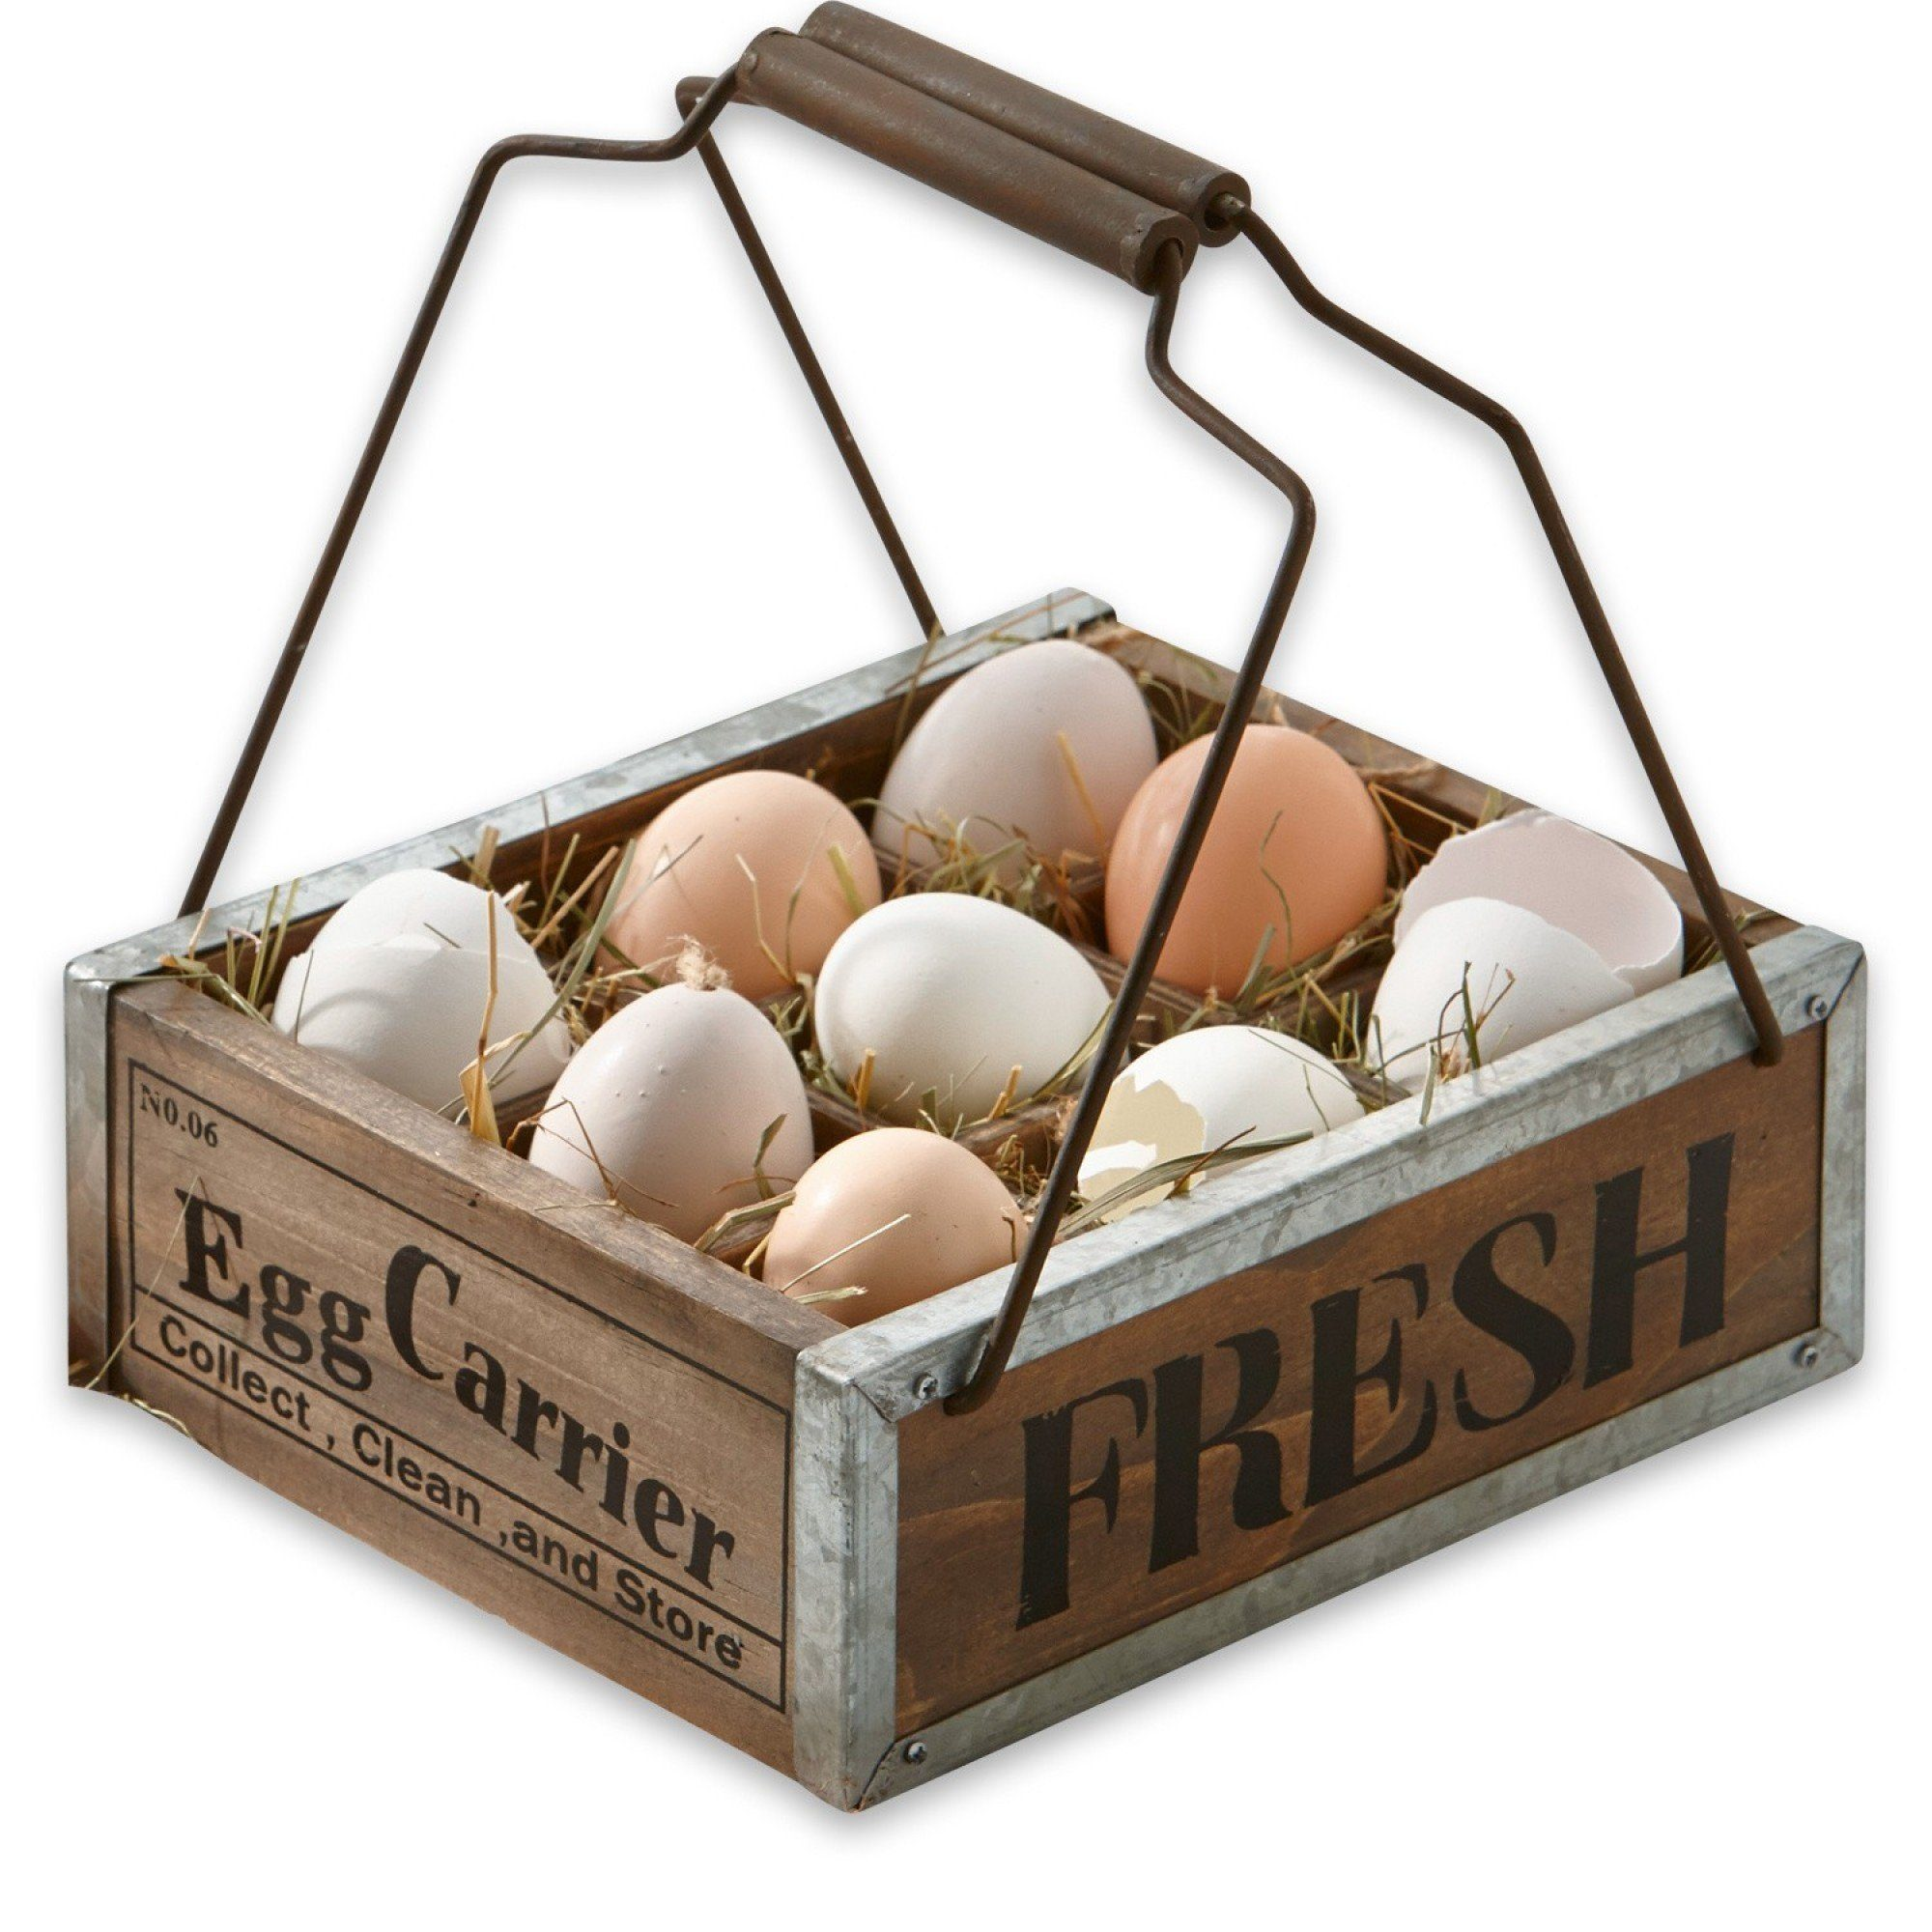 Loberon Eierkorb »Egg Carrier«